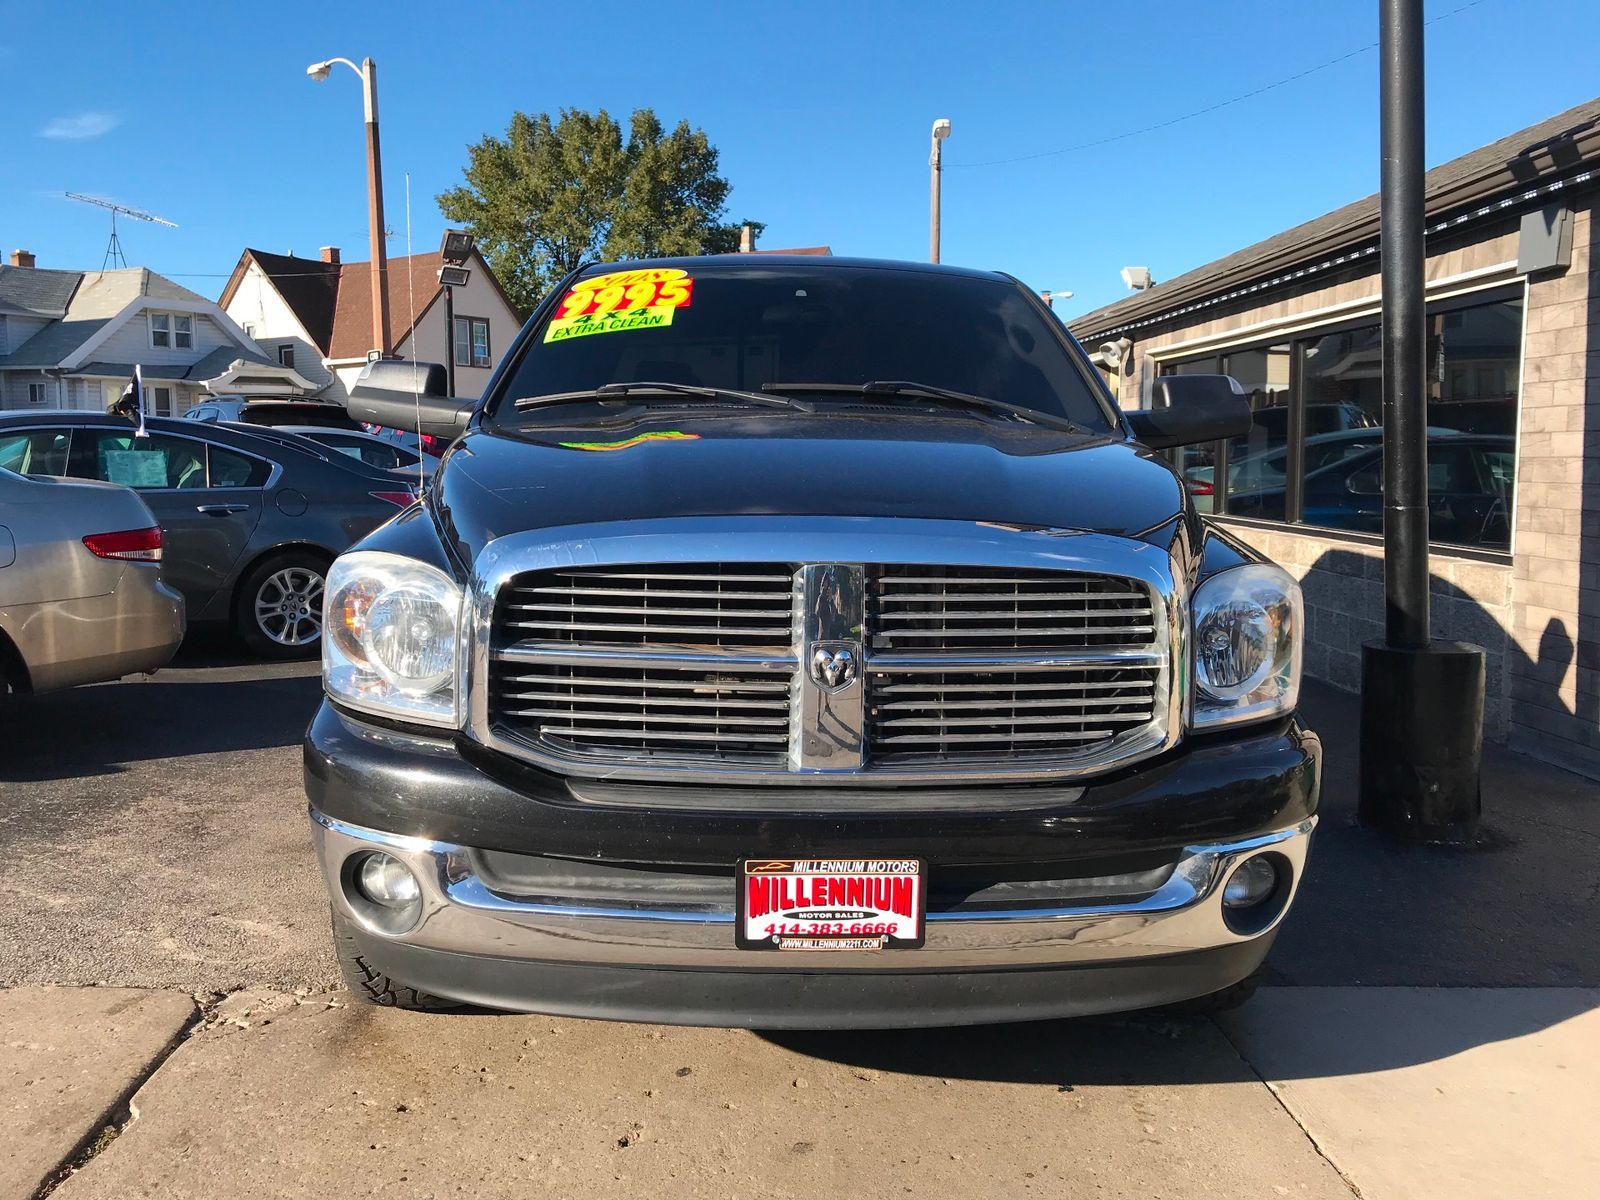 2008 Dodge Ram 1500 St City Wisconsin Millennium Motor Sales In